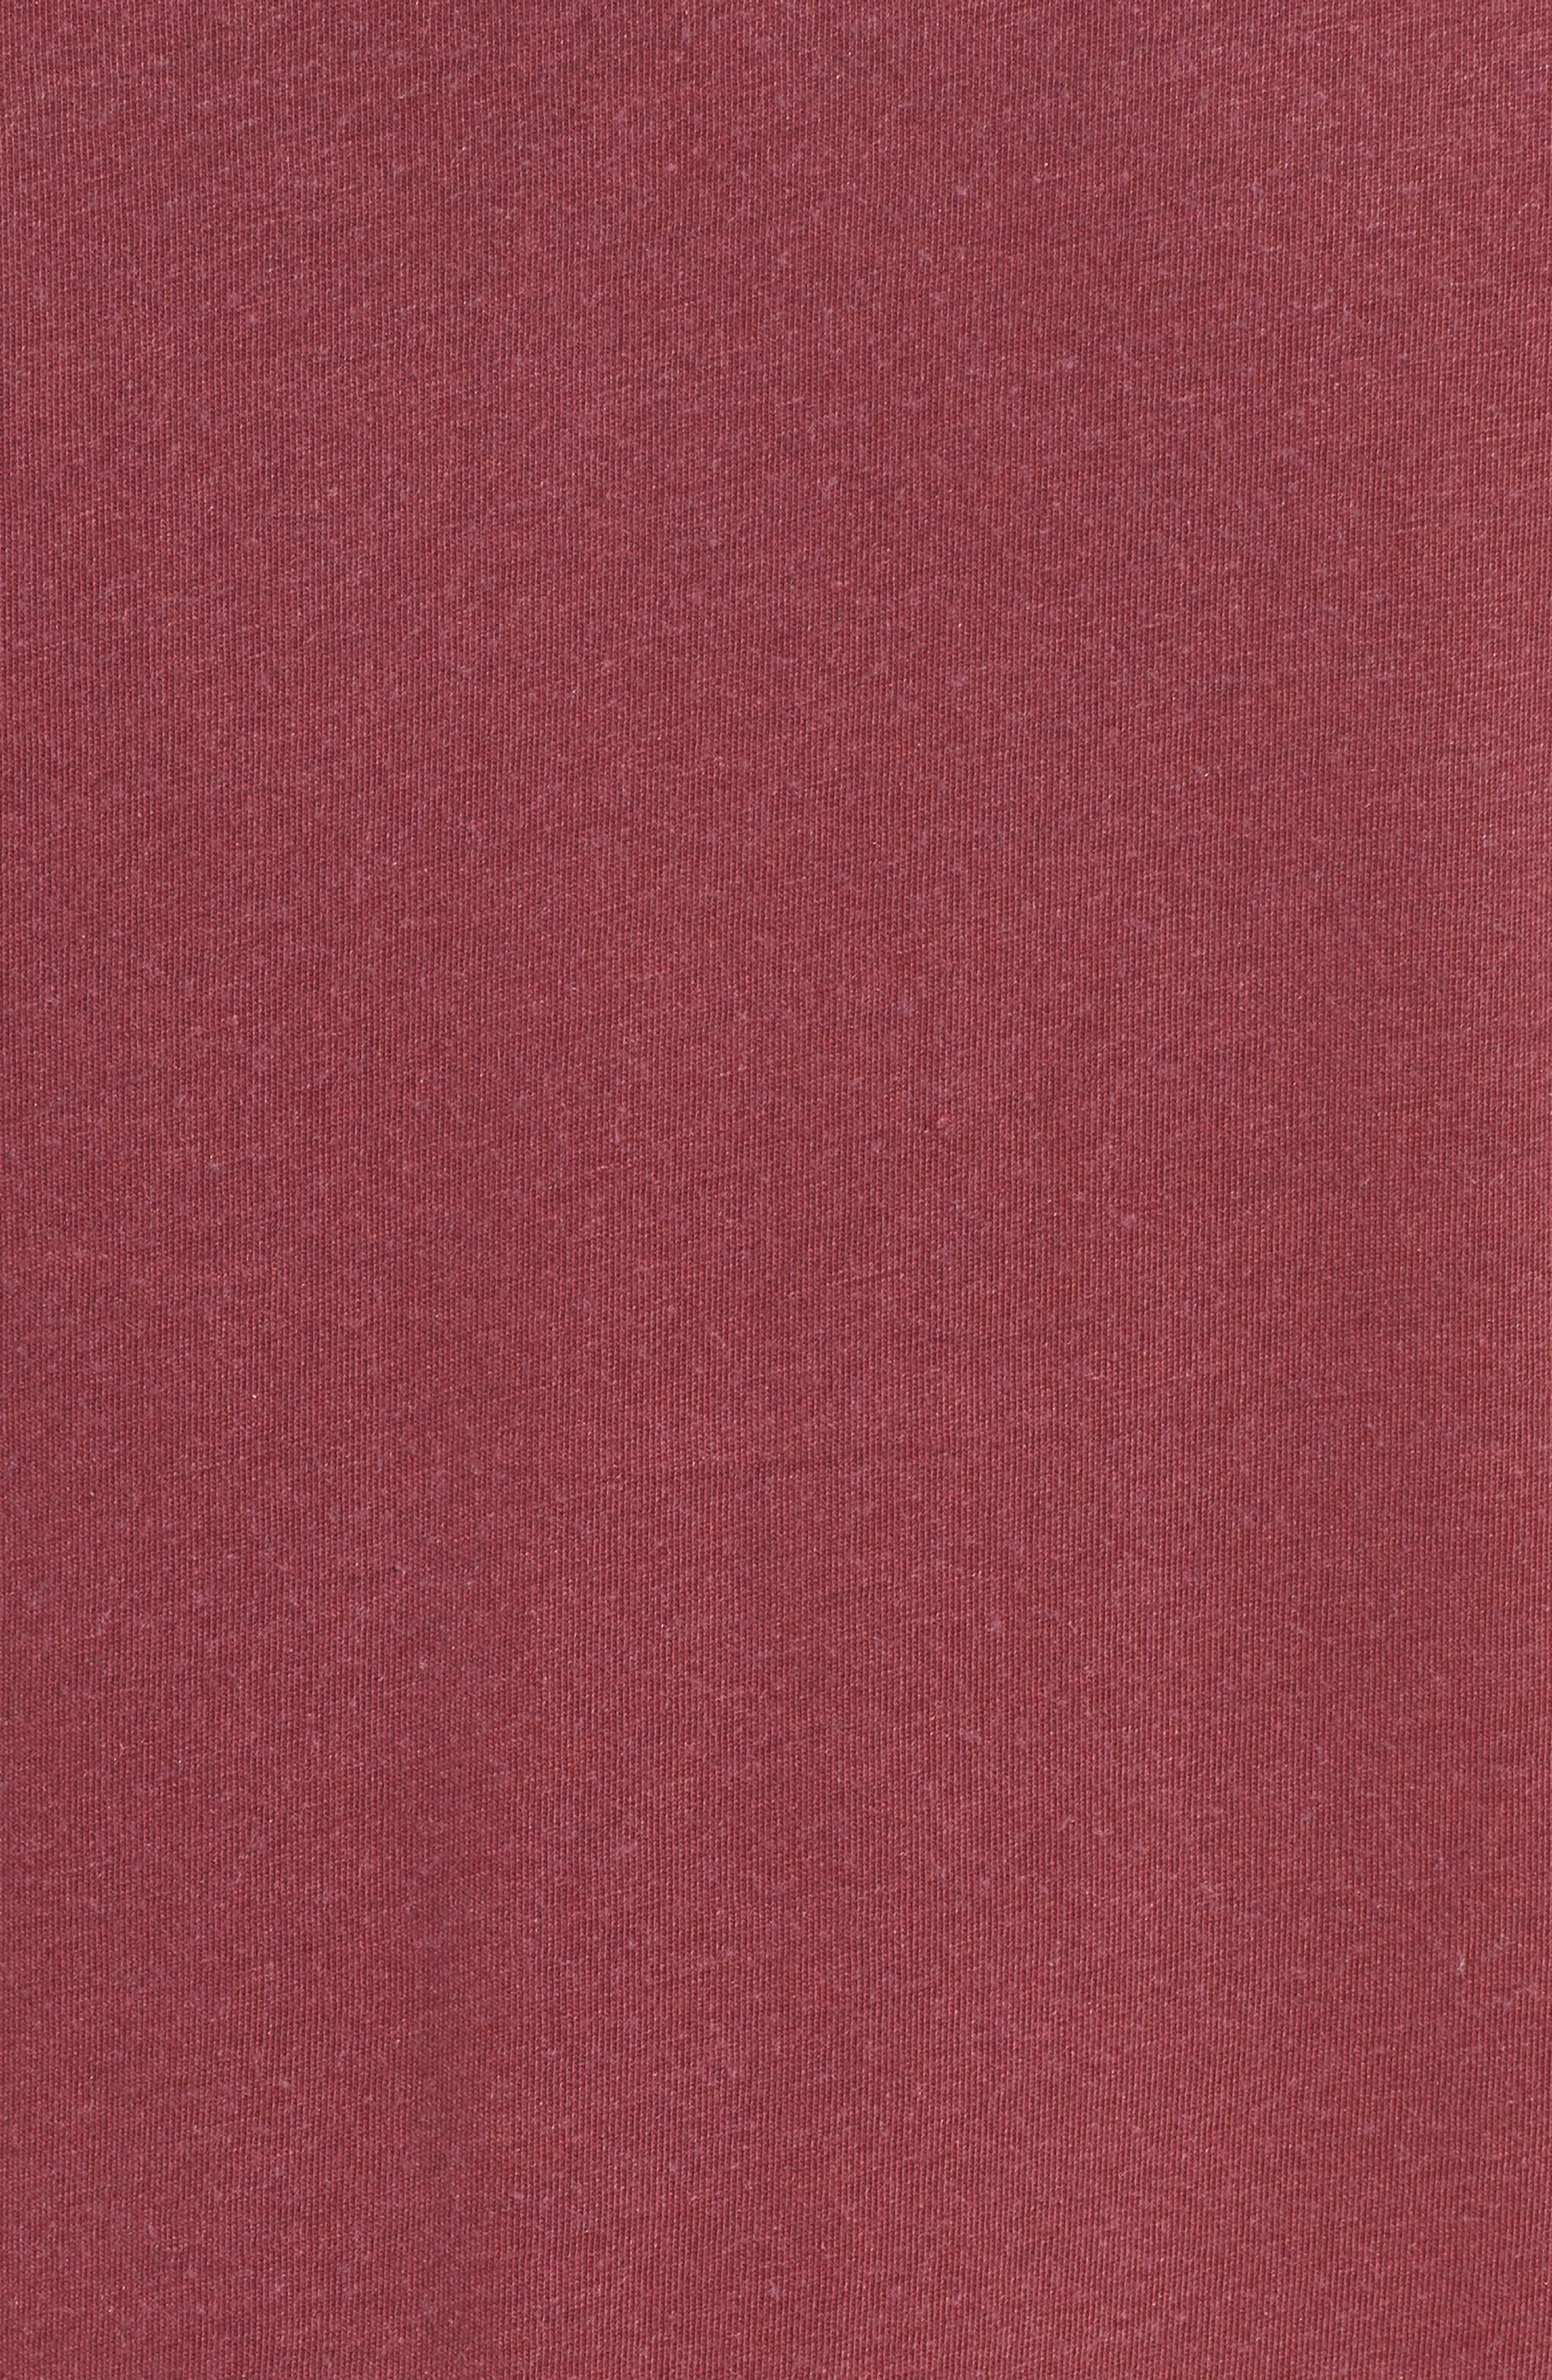 Slim Fit Scoop Neck T-Shirt,                             Alternate thumbnail 10, color,